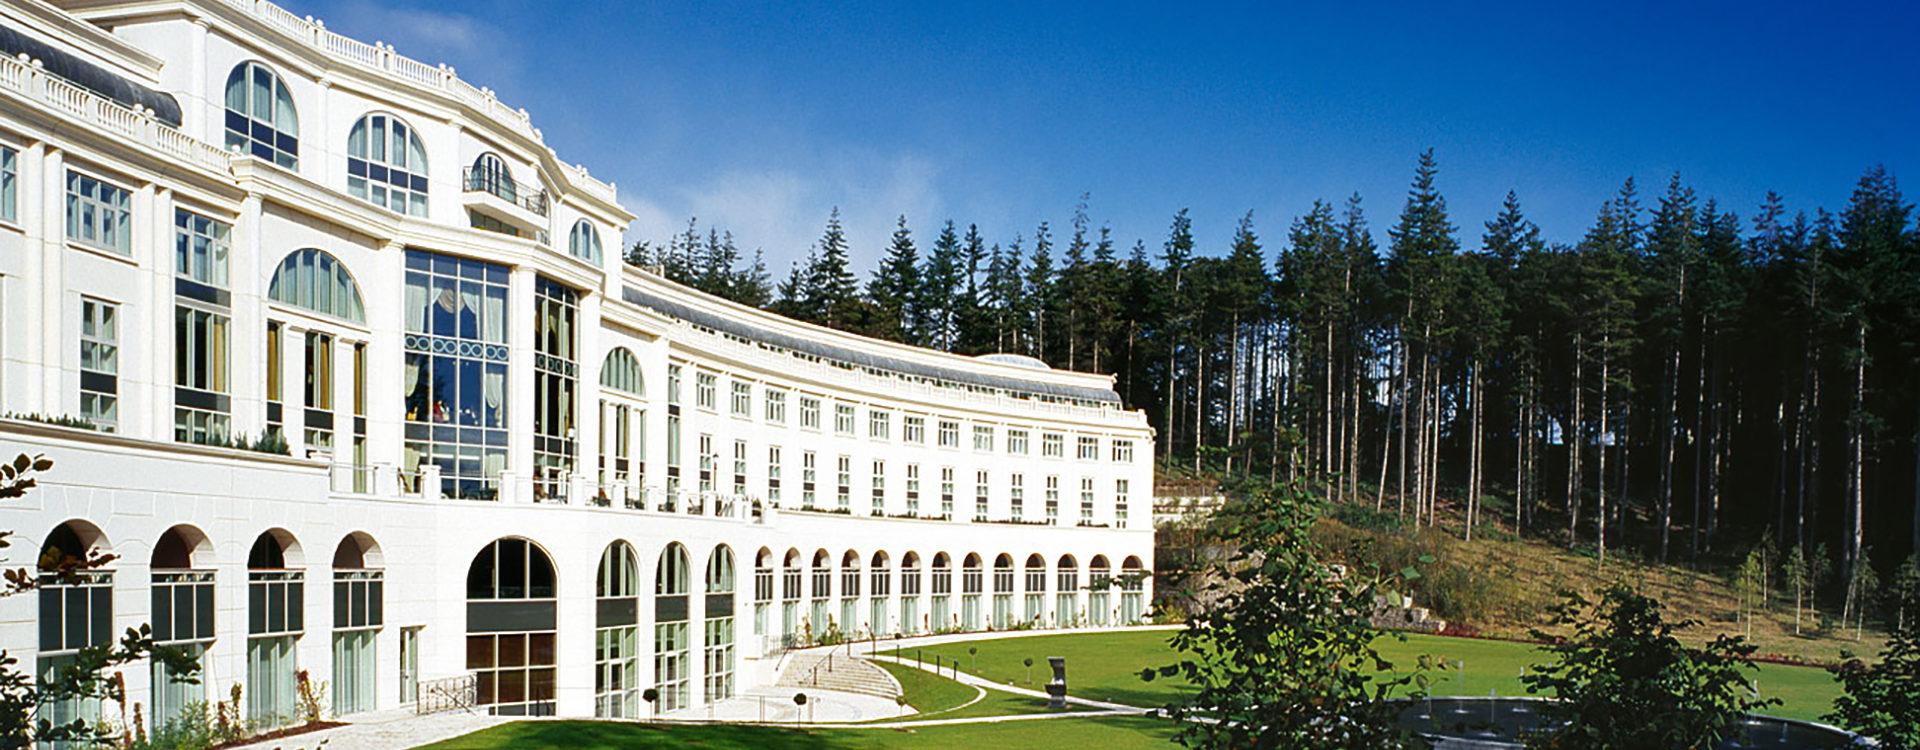 Powerscourt house hotel